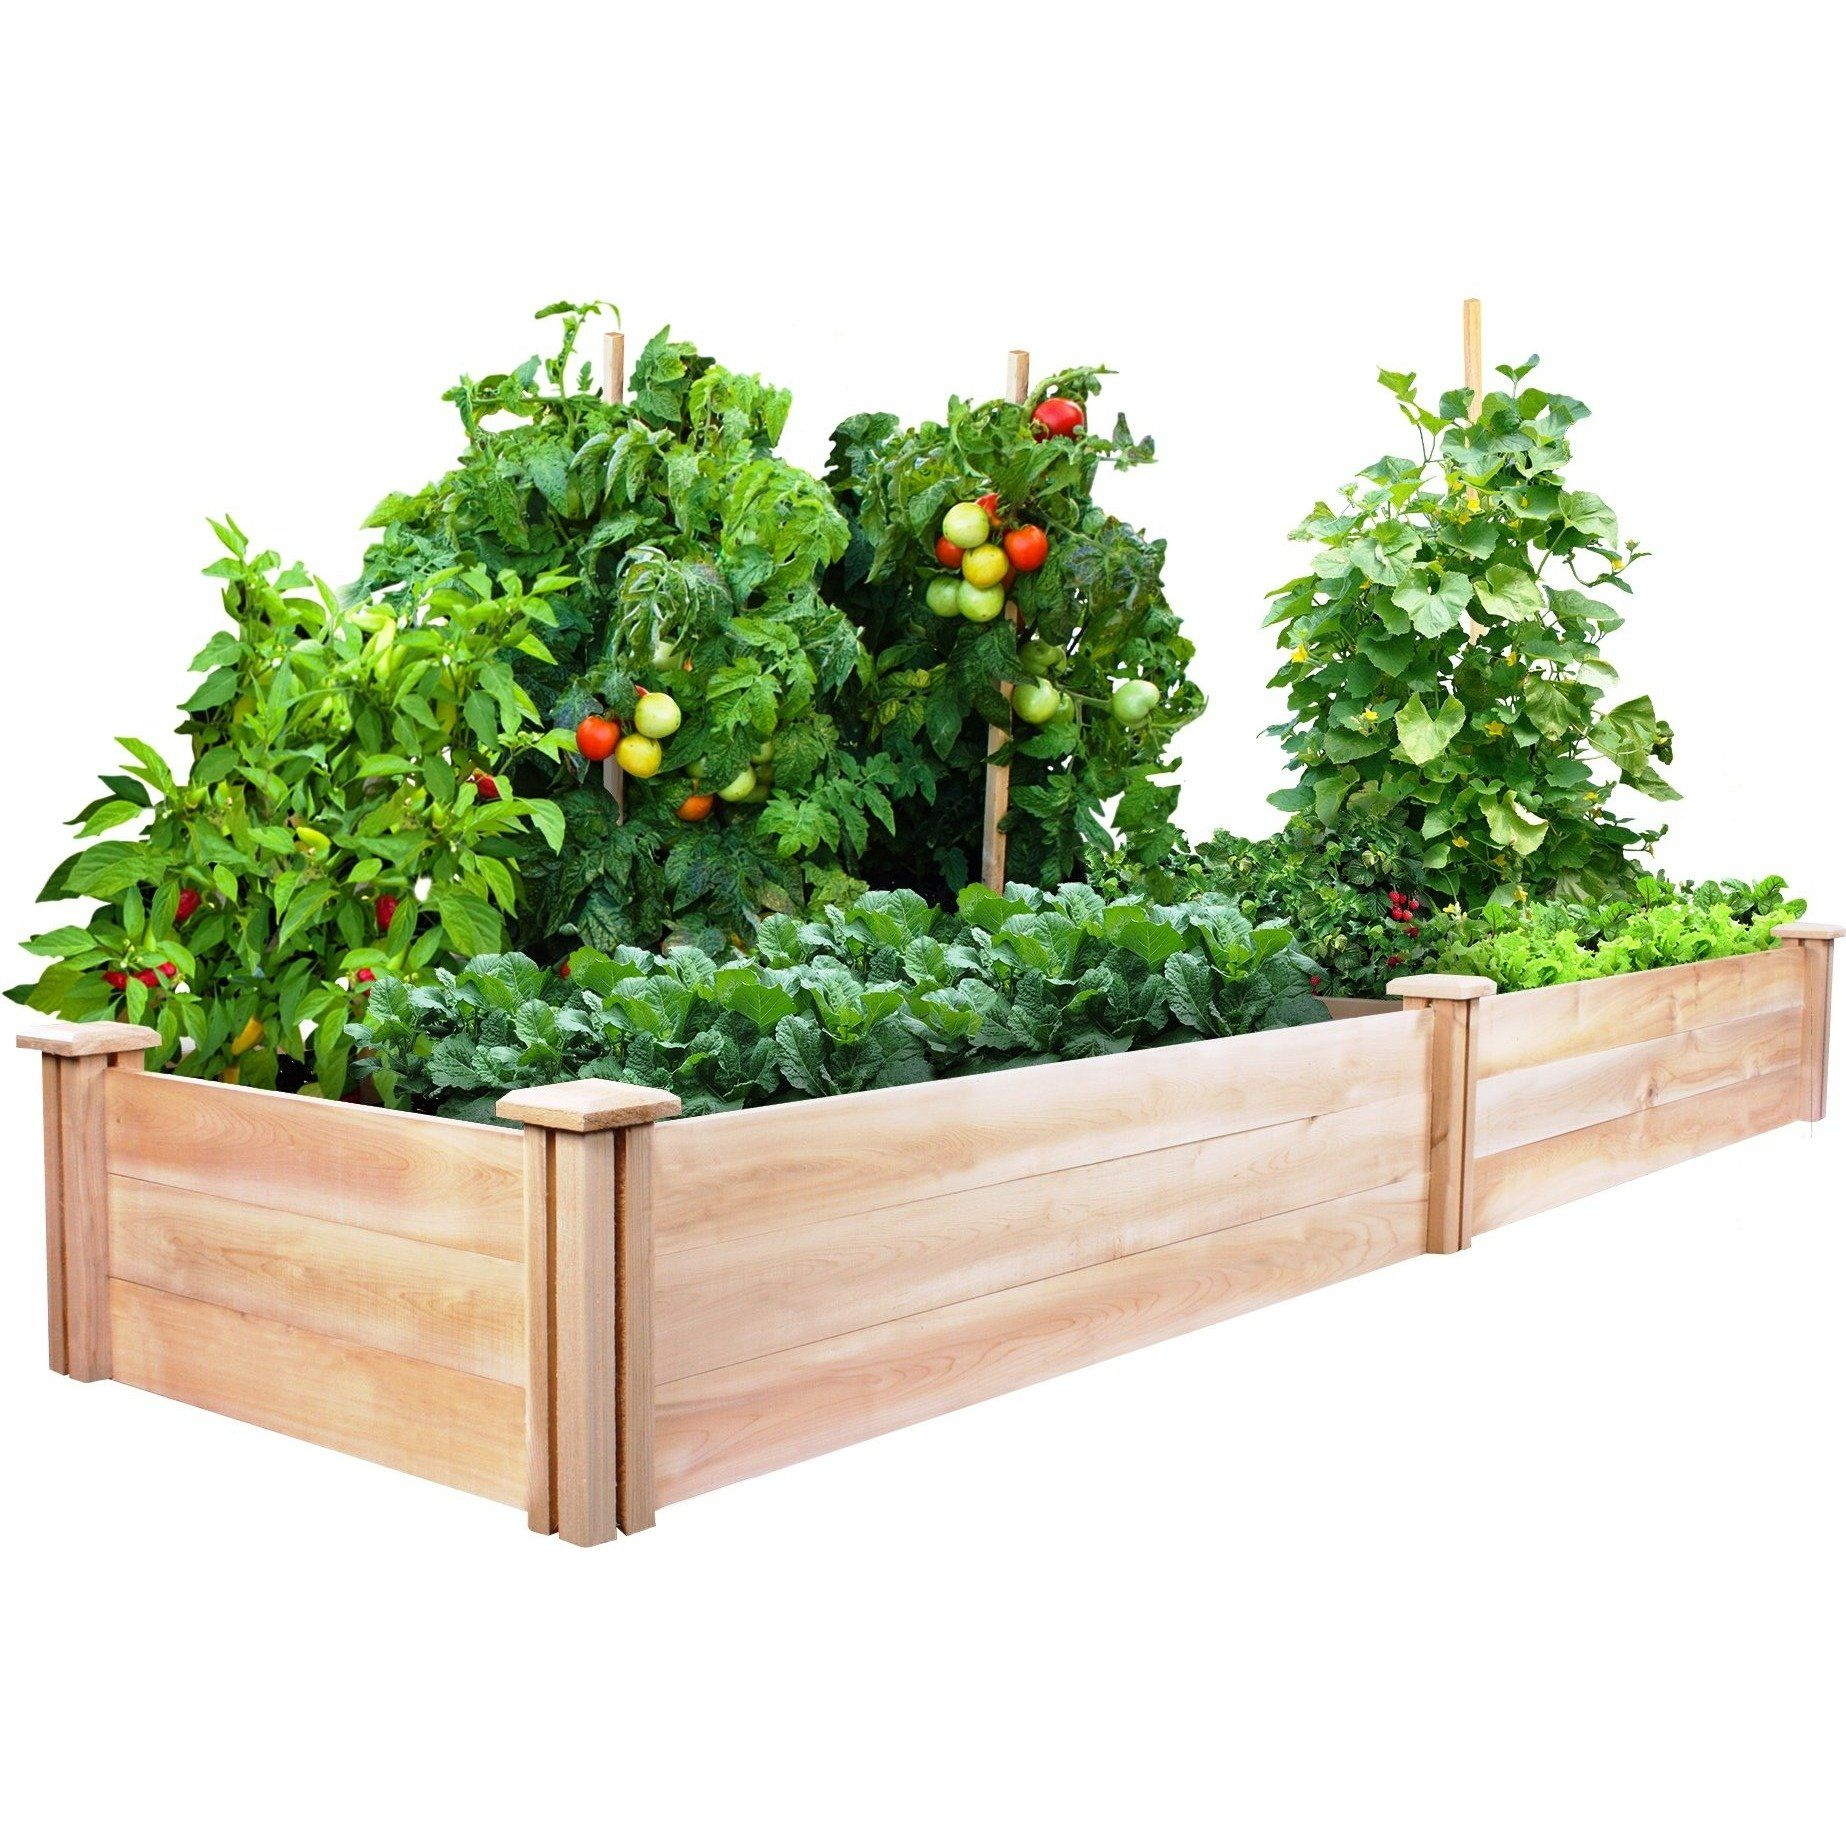 2ed0bafb287d51702ec32ebdf7d991ee - Greenland Gardener Cedar Garden Bed Kit